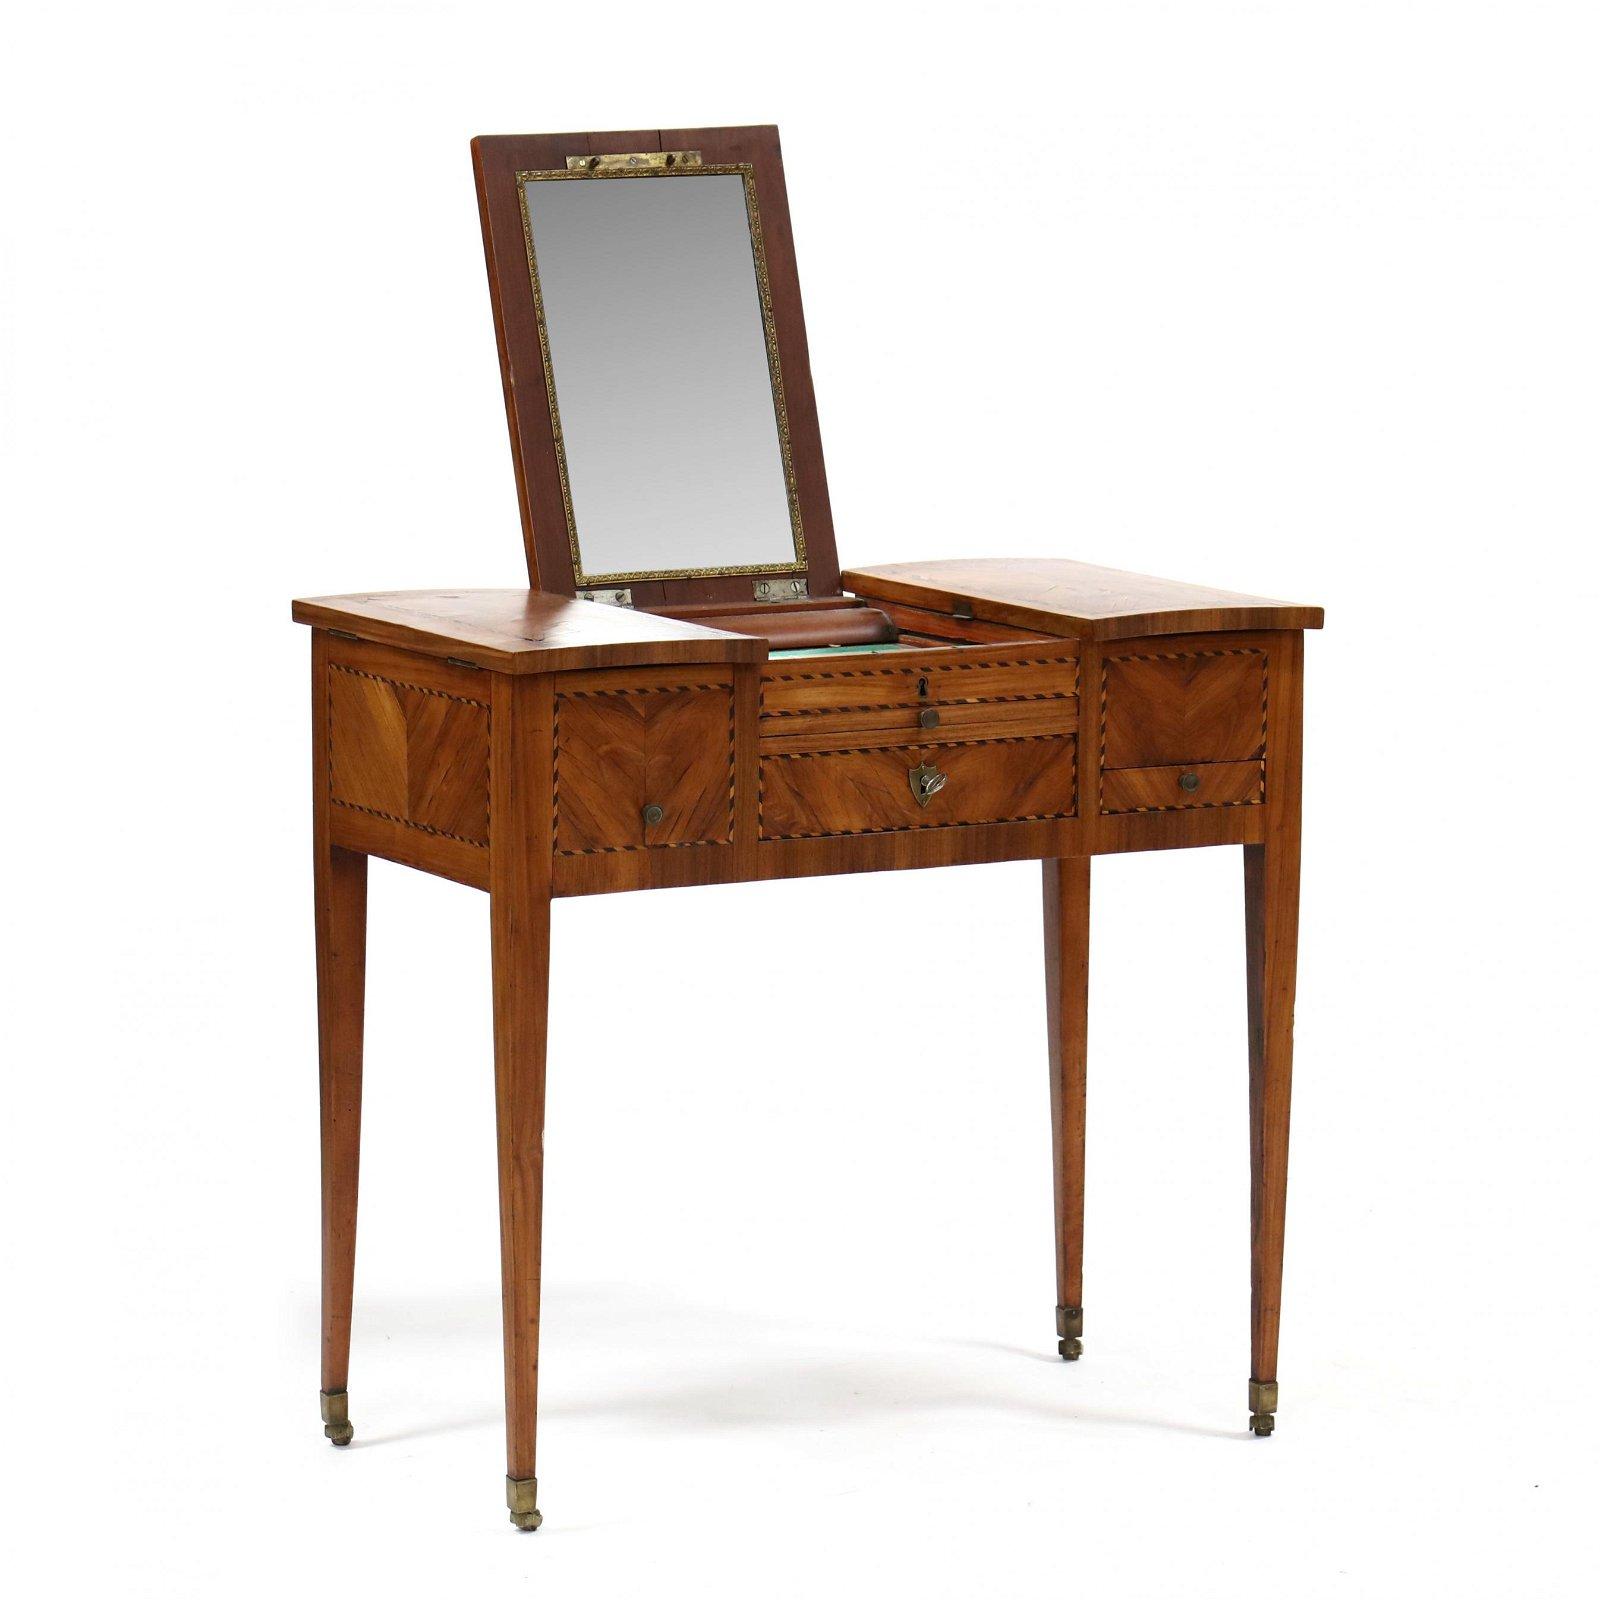 Antique Continental Inlaid Walnut Vanity